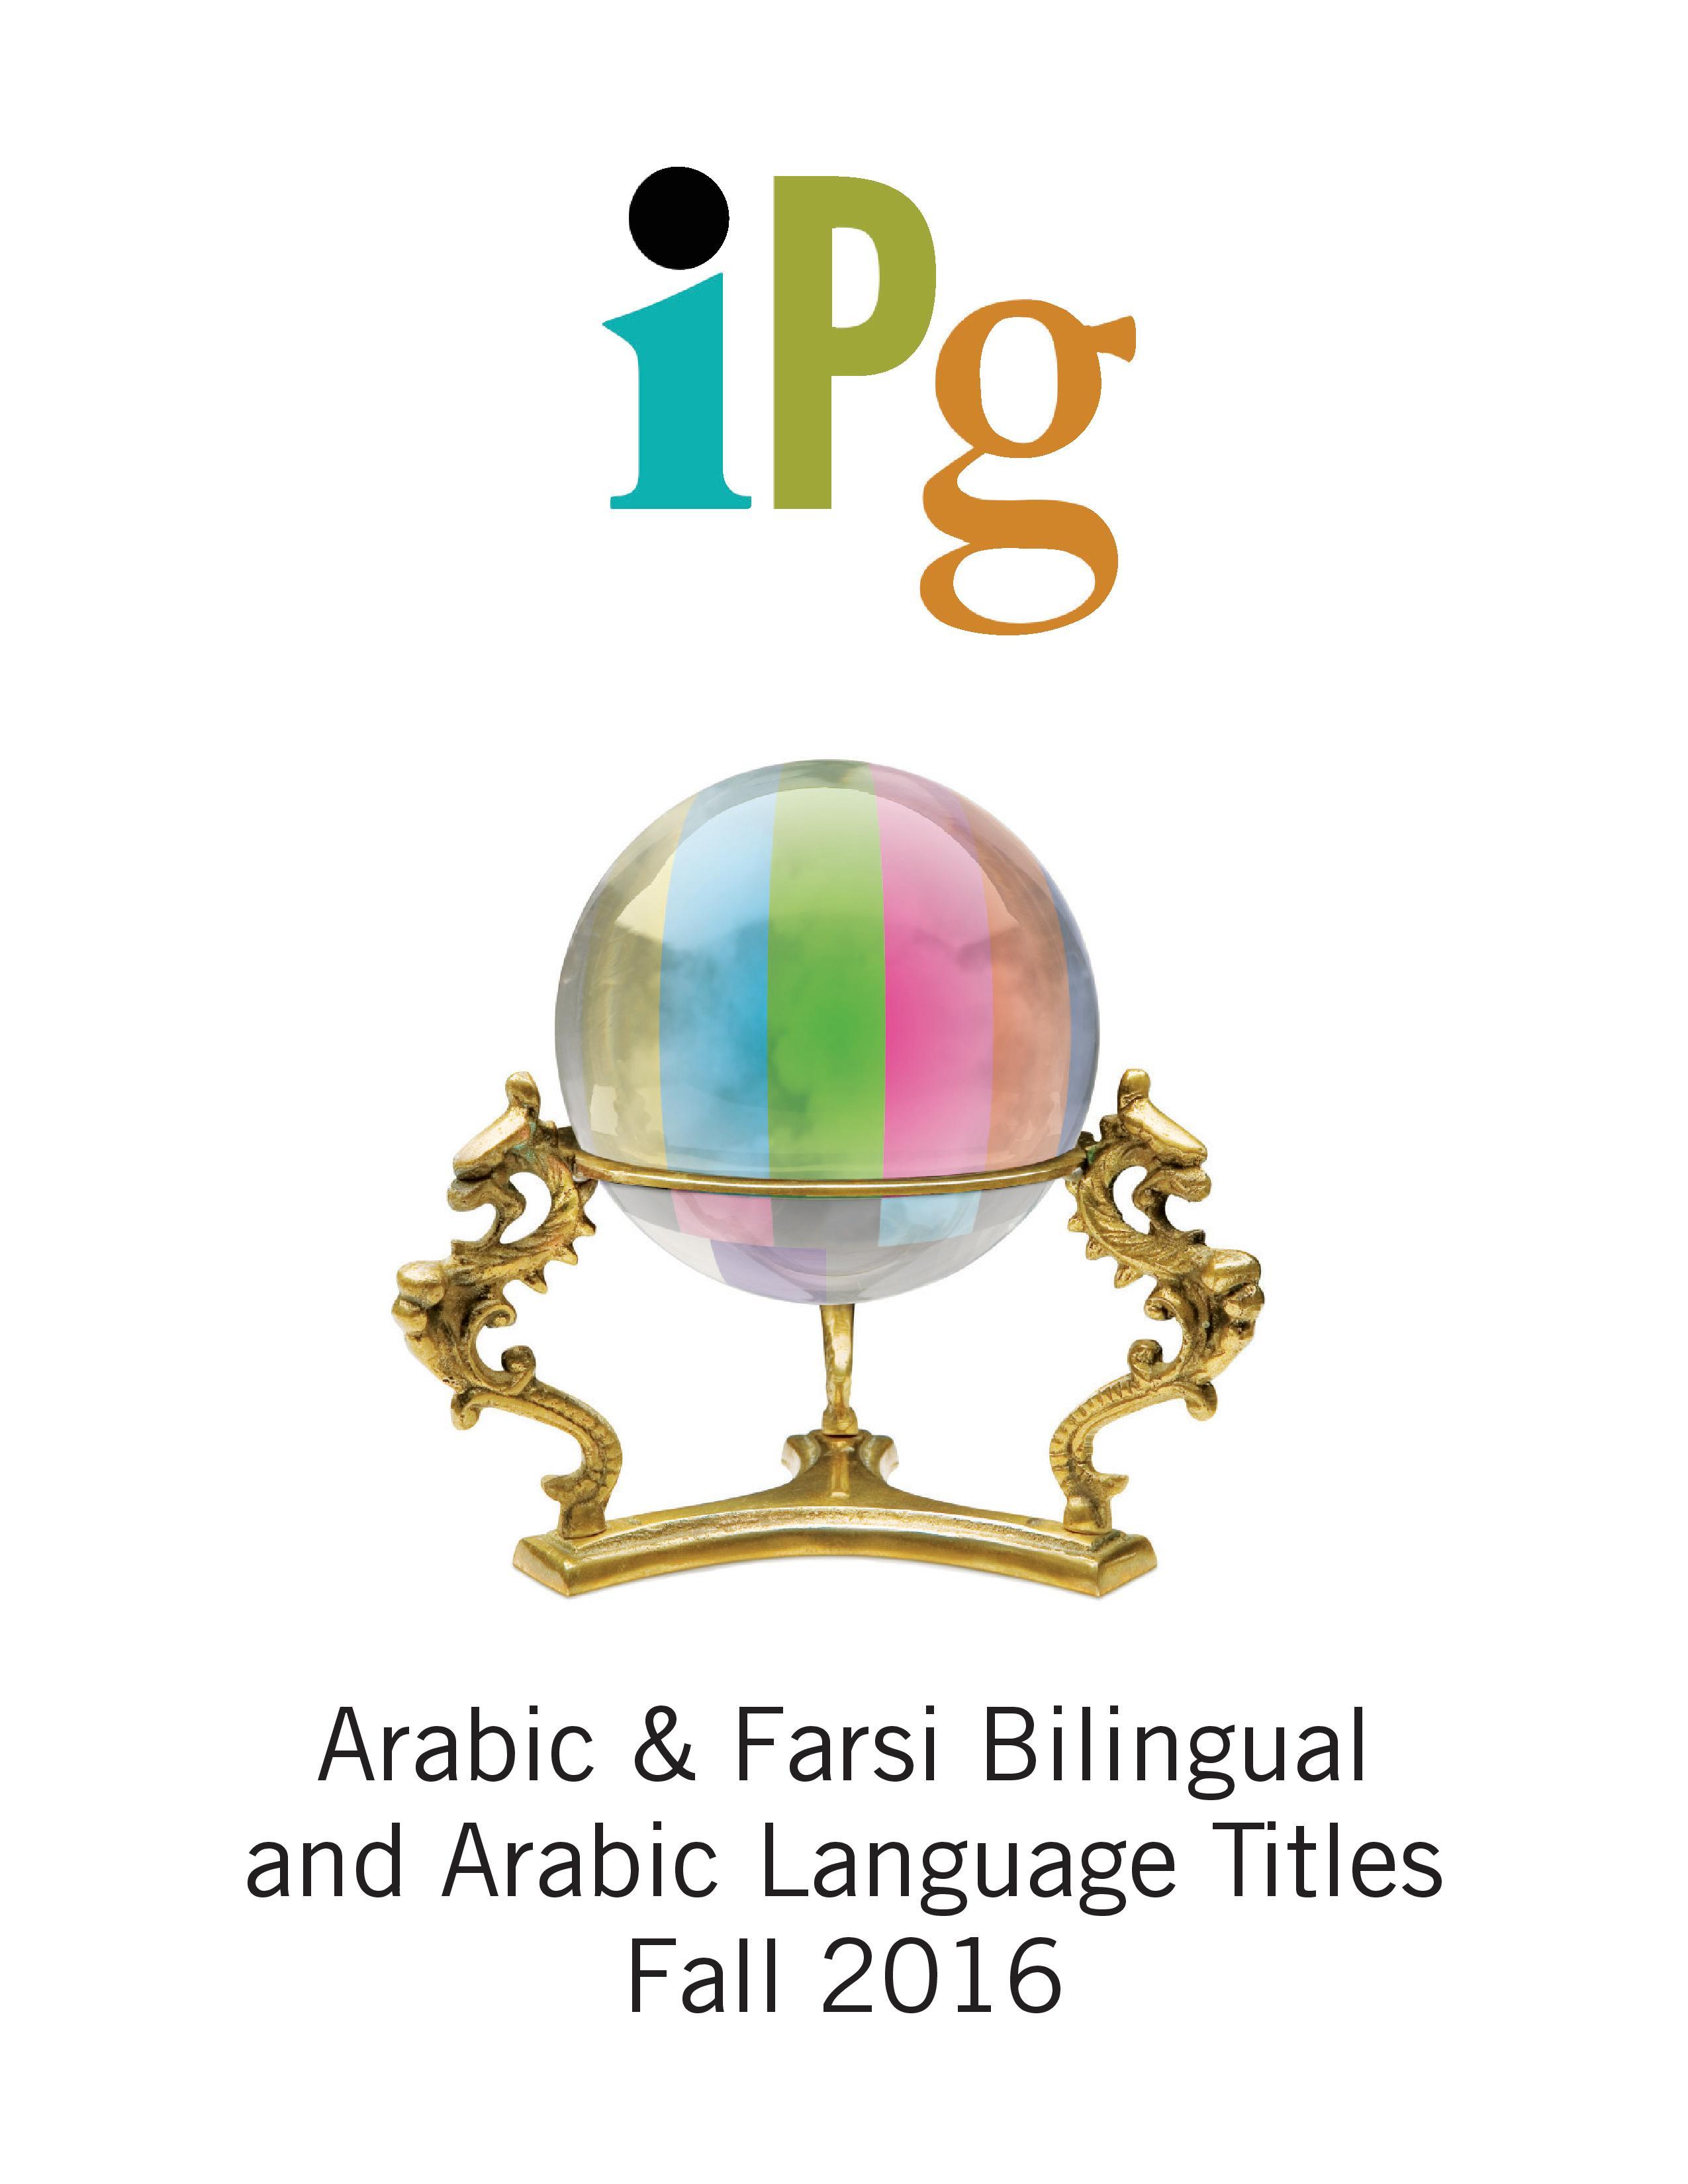 Bilingual Arabic and Farsi Titles